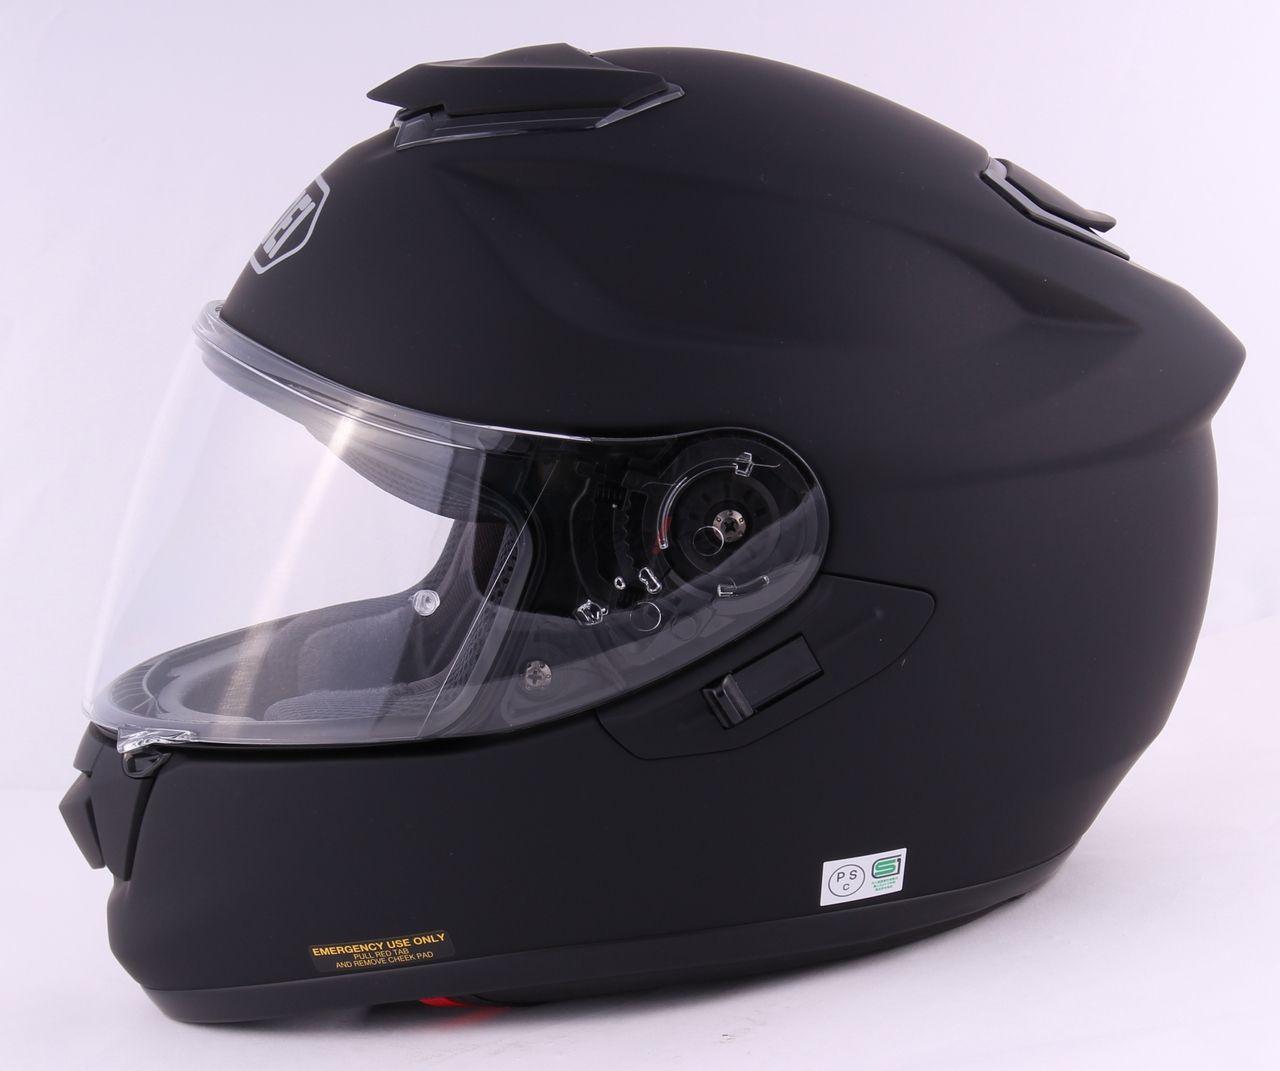 【SHOEI】GT-Air 全罩式安全帽 - 「Webike-摩托百貨」